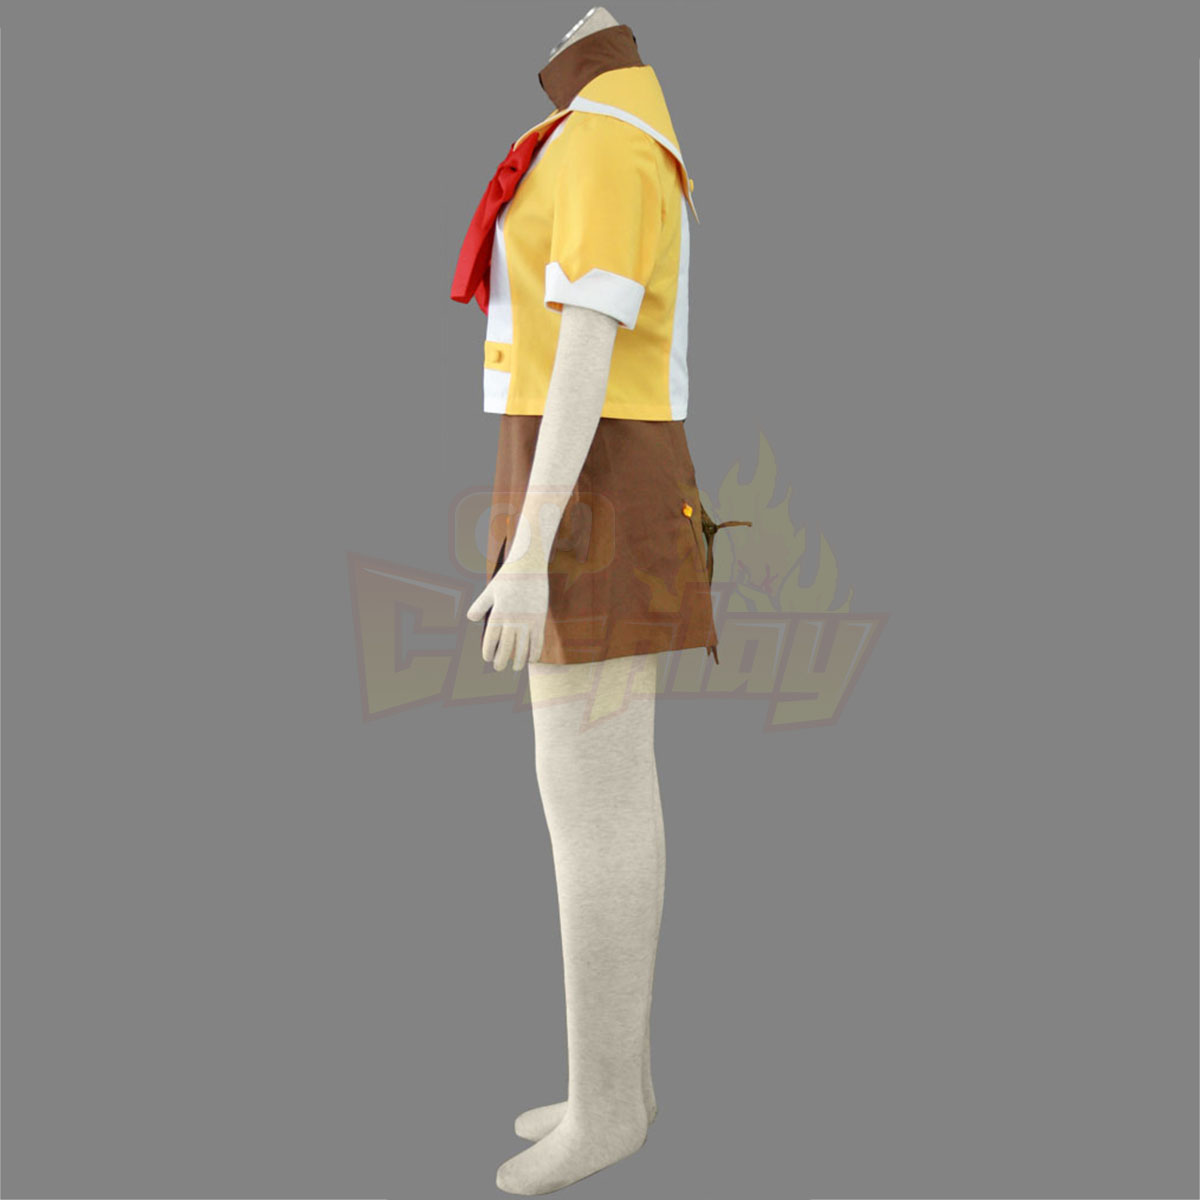 Macross F Ranka Lee 4TH Cosplay Costumes Deluxe Edition